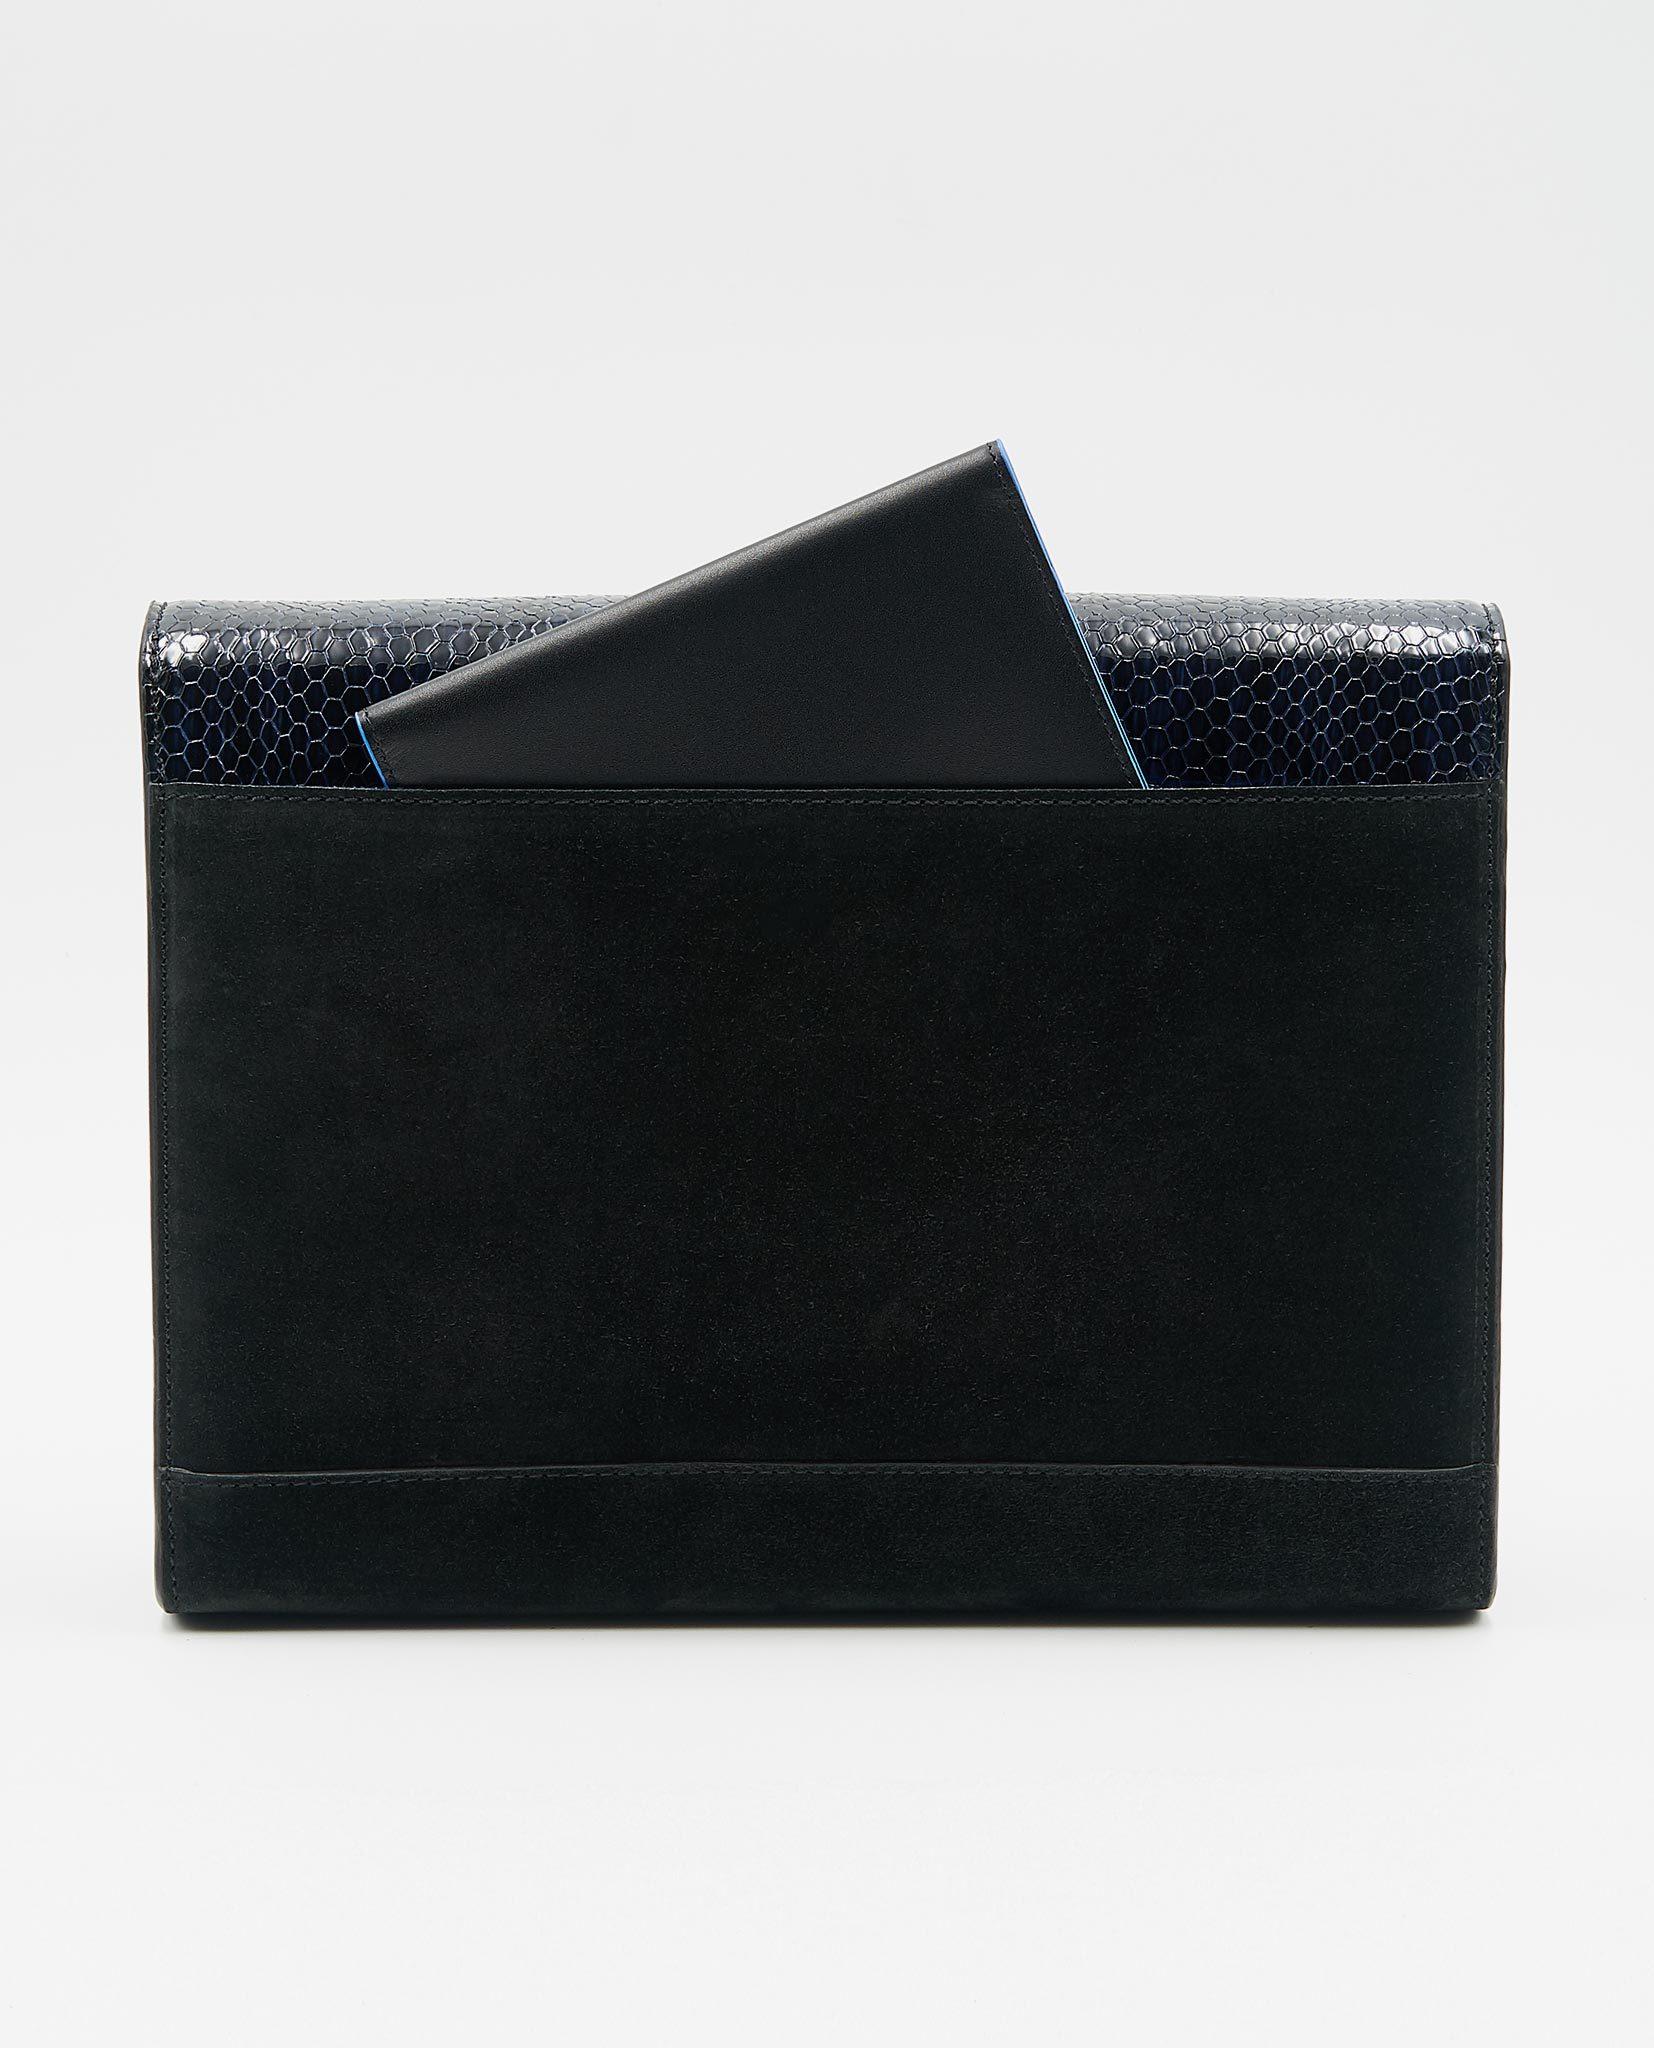 cef5a53b596b Soofre Clutch limited Black-Snake 3. Berlin-Street-Fashion-Soofre -Suede-Leather-Clutch. Home   Handbags   Unique Clutch MARLENE – Croco  Purple Lilac ...